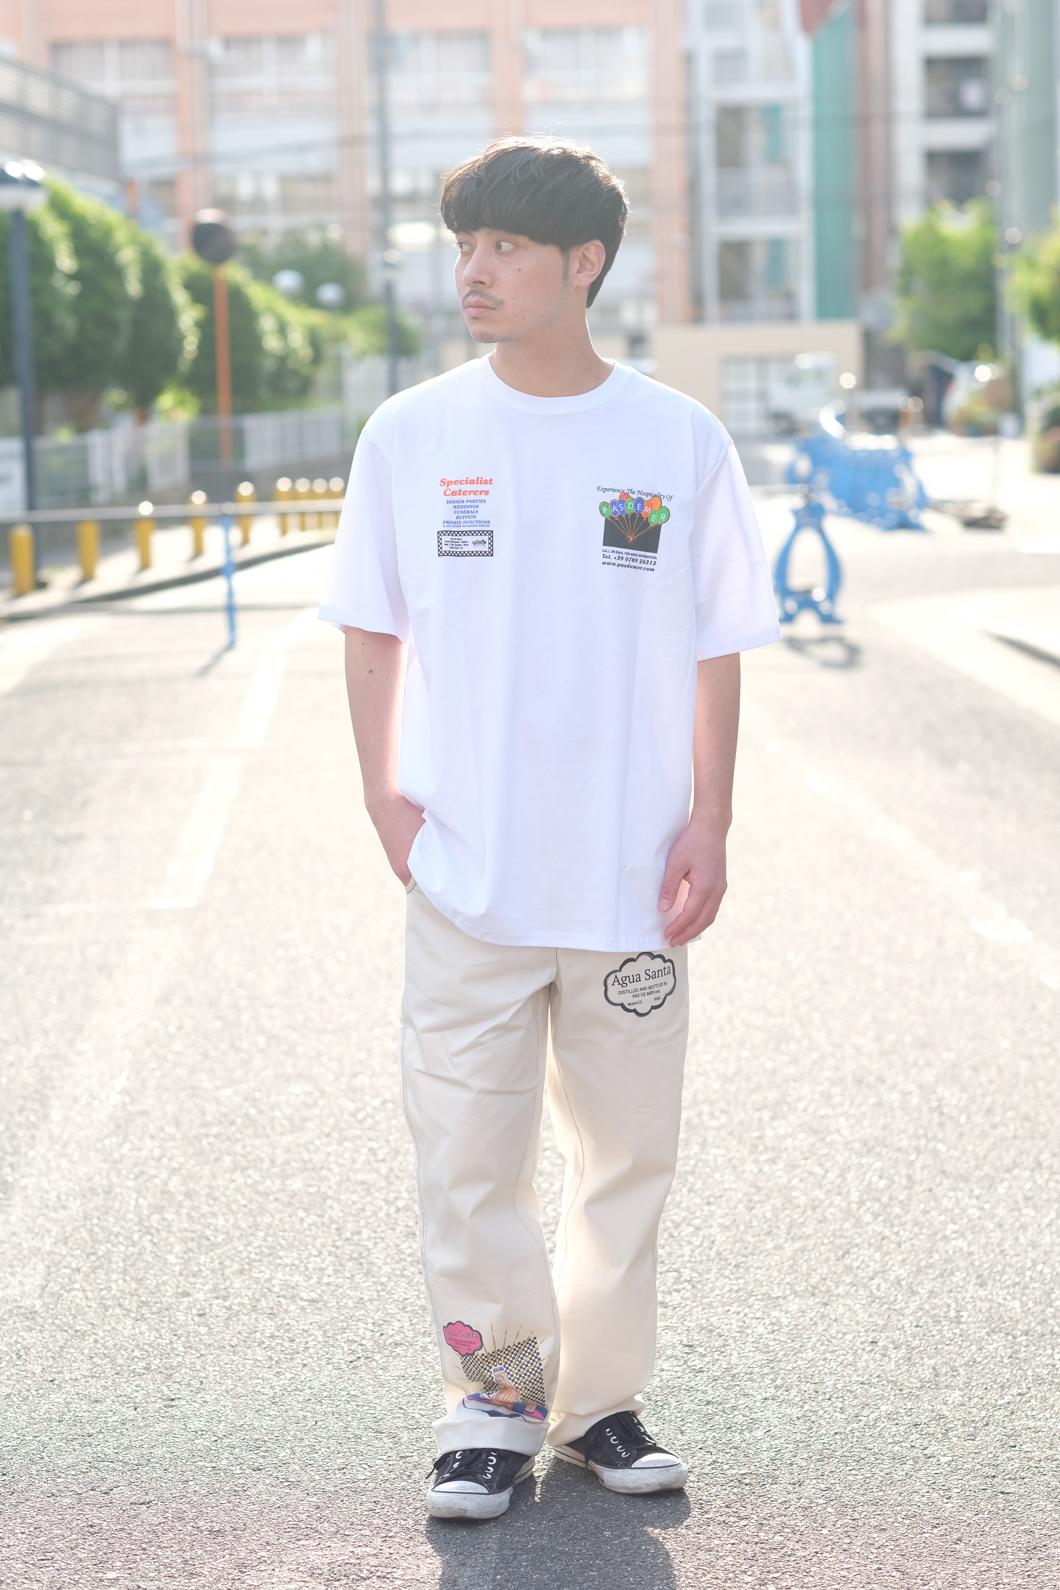 【PAS DE MER/パドゥメ】CATERING T-SHIRT Tシャツ / WHITE